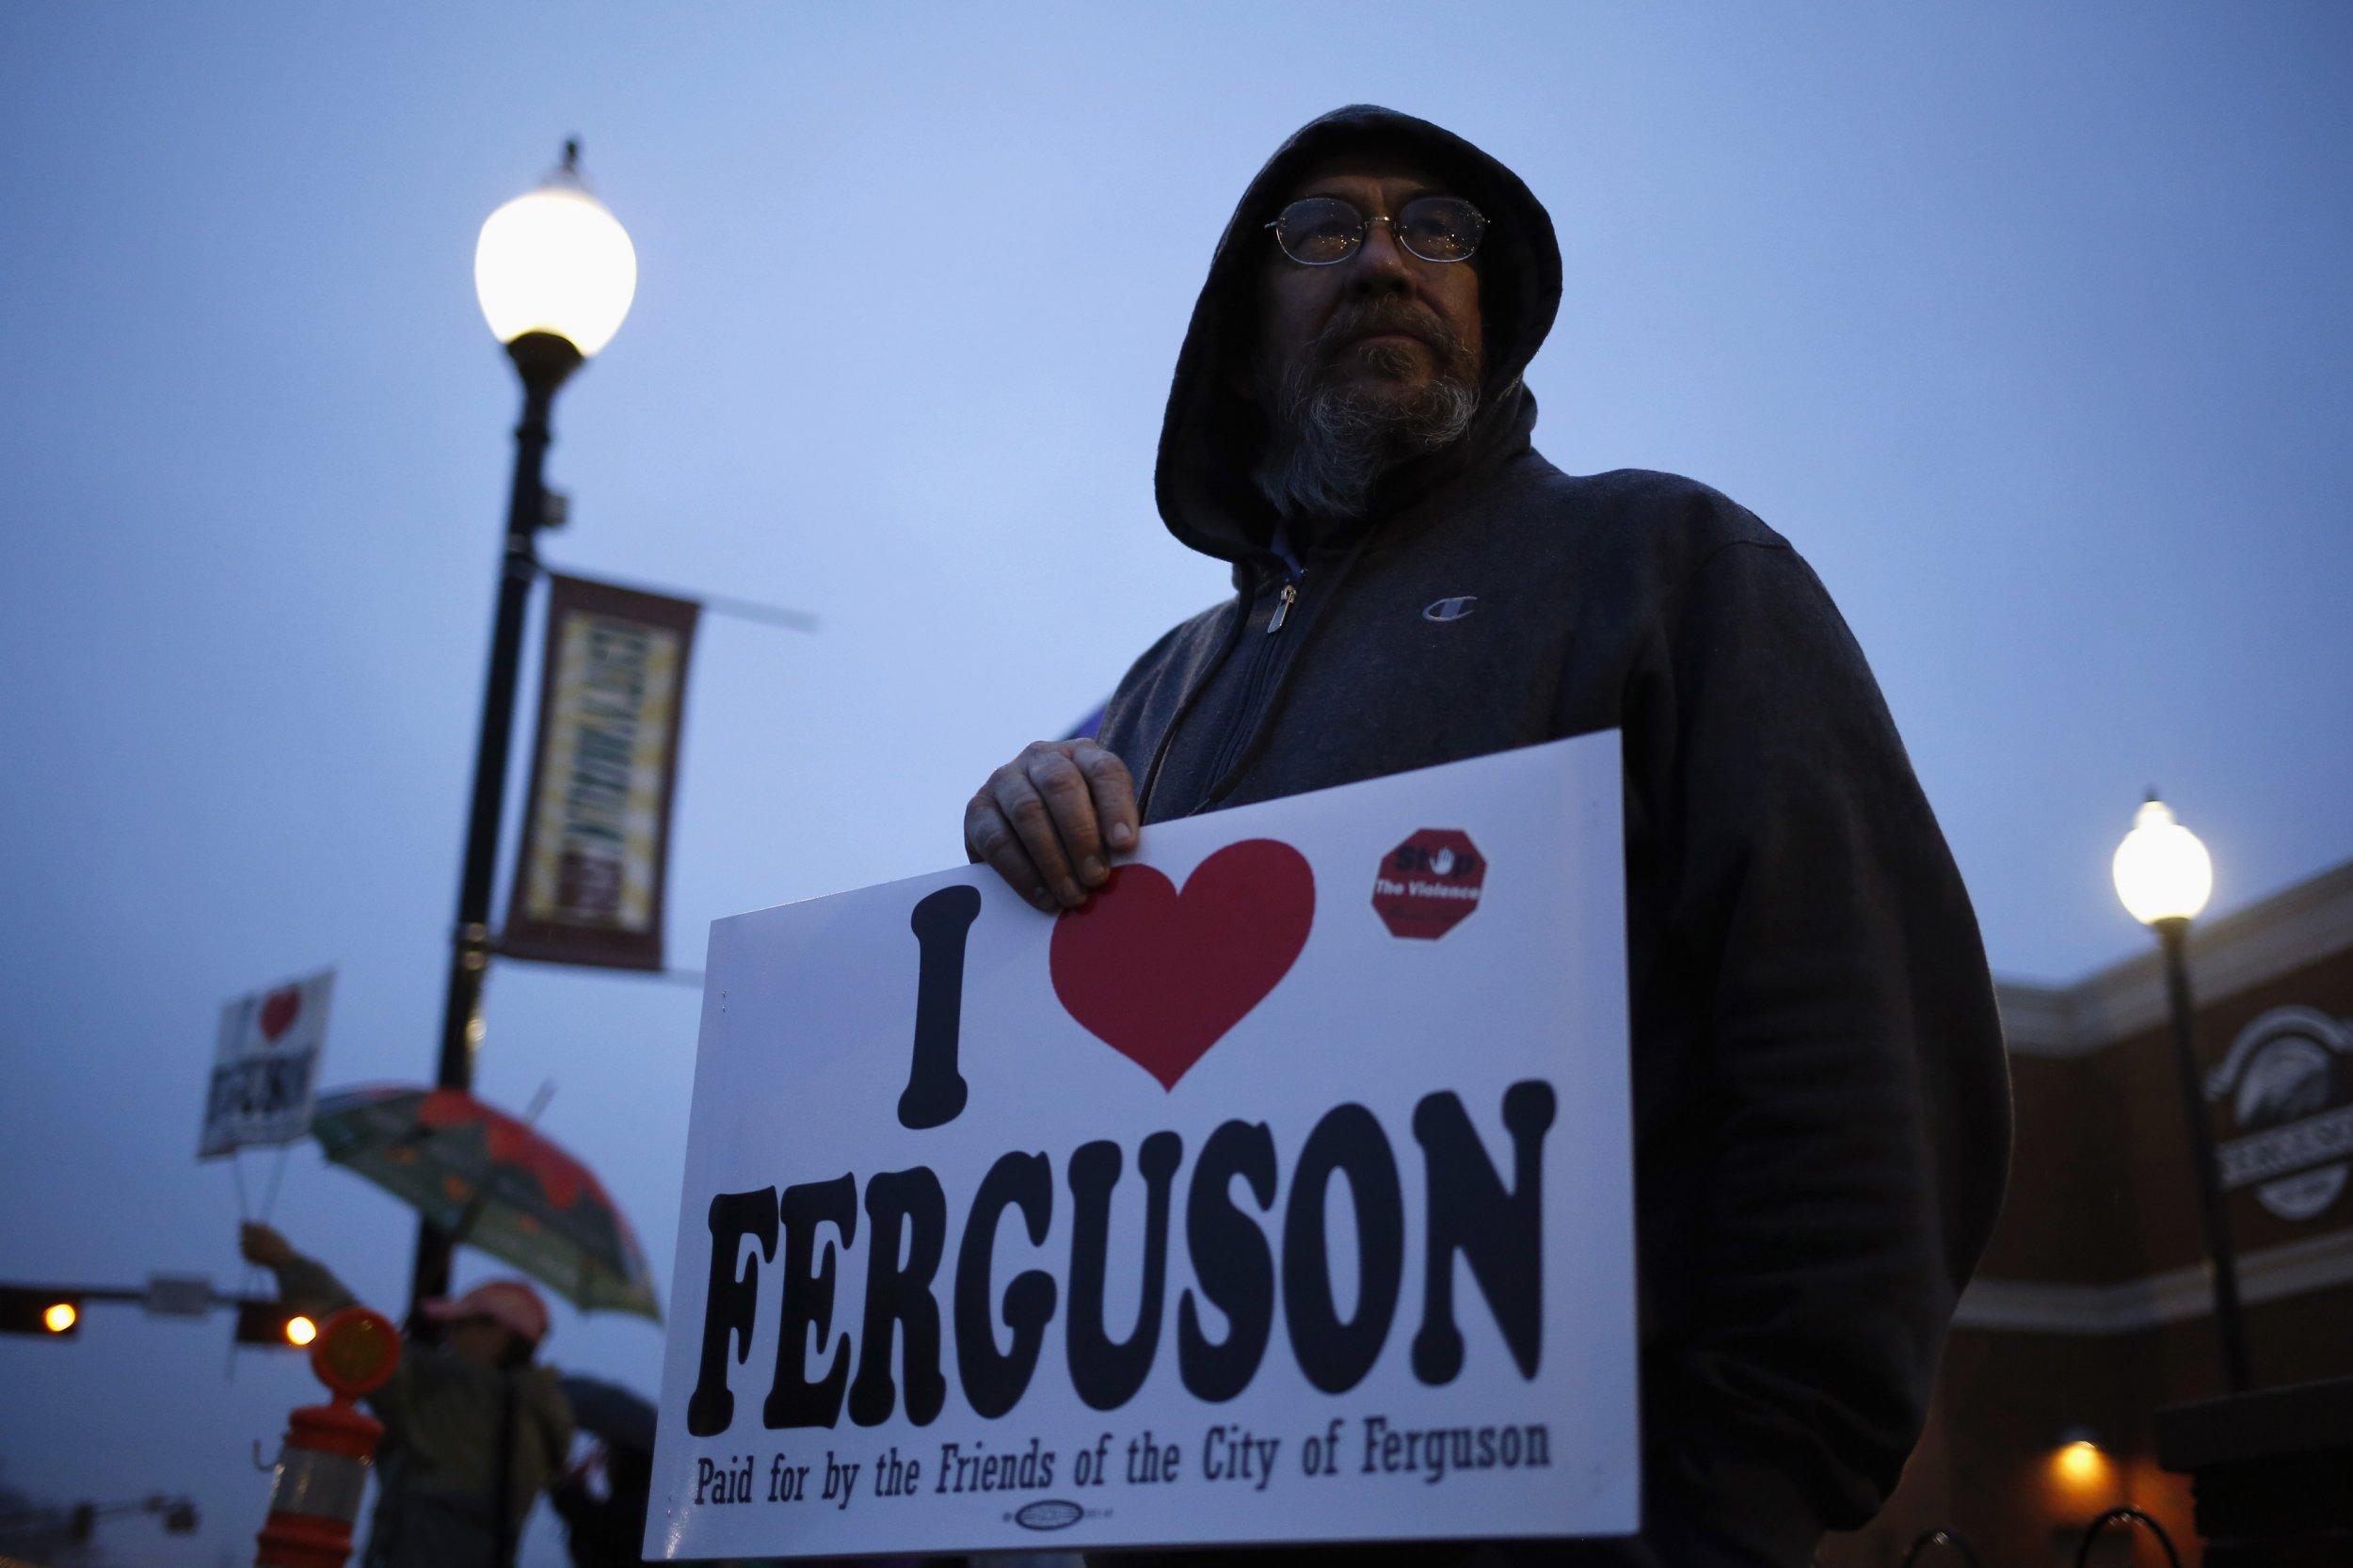 Ferguson, Missouri